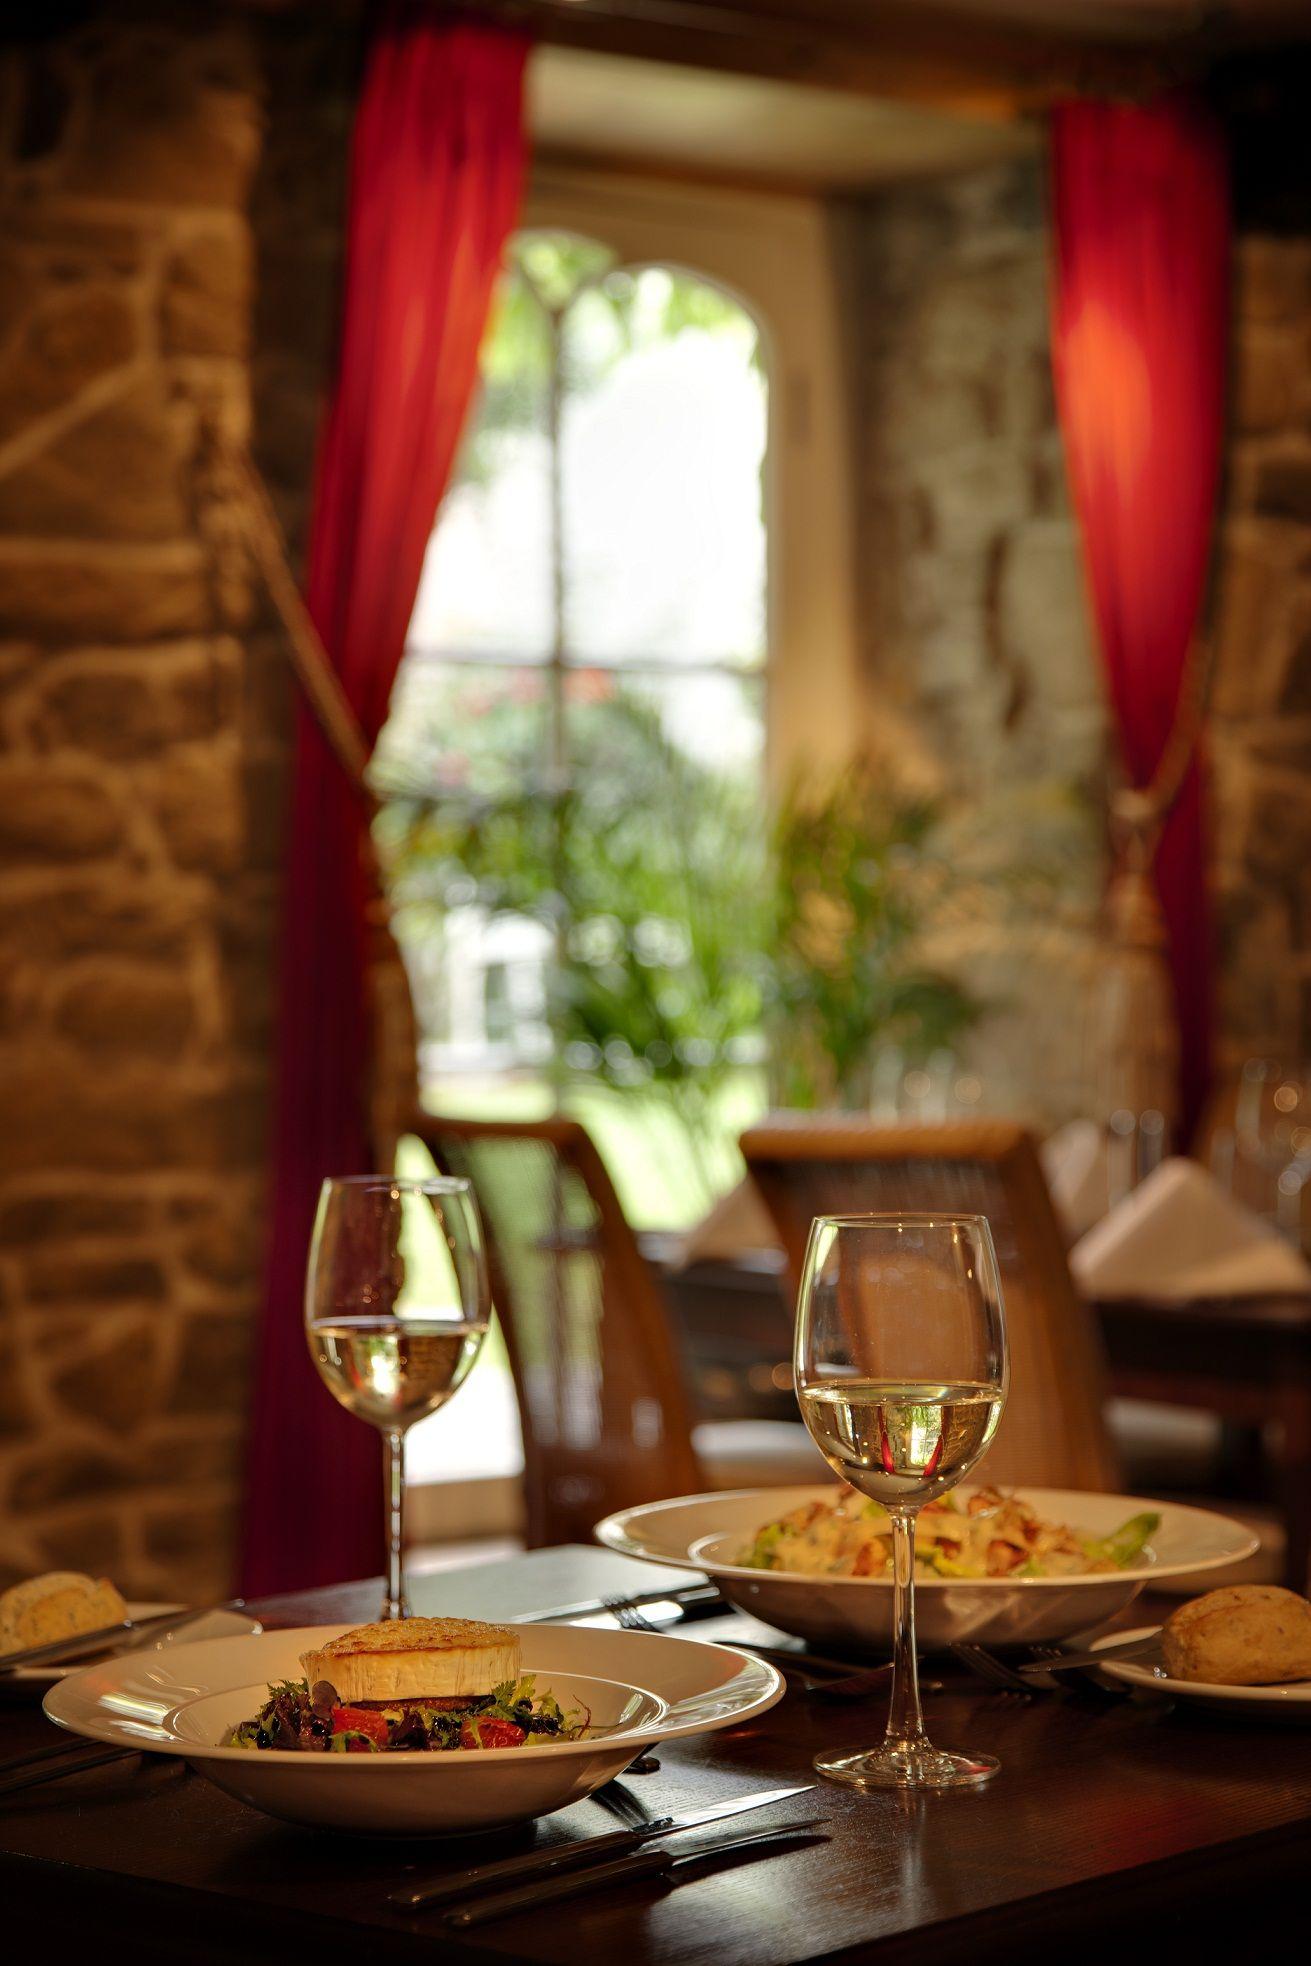 Enjoy A Dinner For Two In One Of Guernsey S Fantasic Restaurants